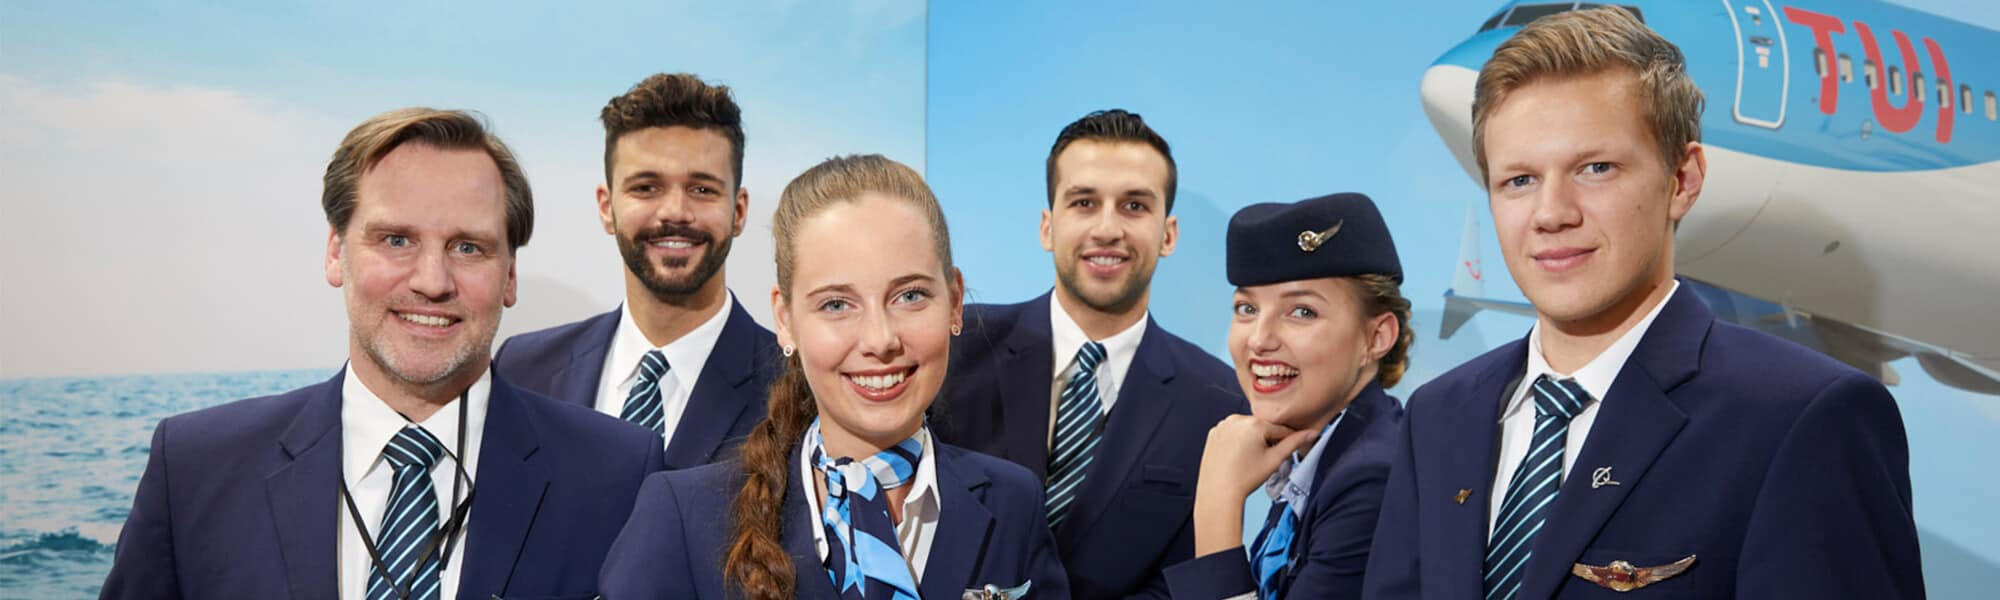 "Die Recruitment-Messe ""Pilot Expo"" am 22. und 23. Februar 2019 in Berlin"